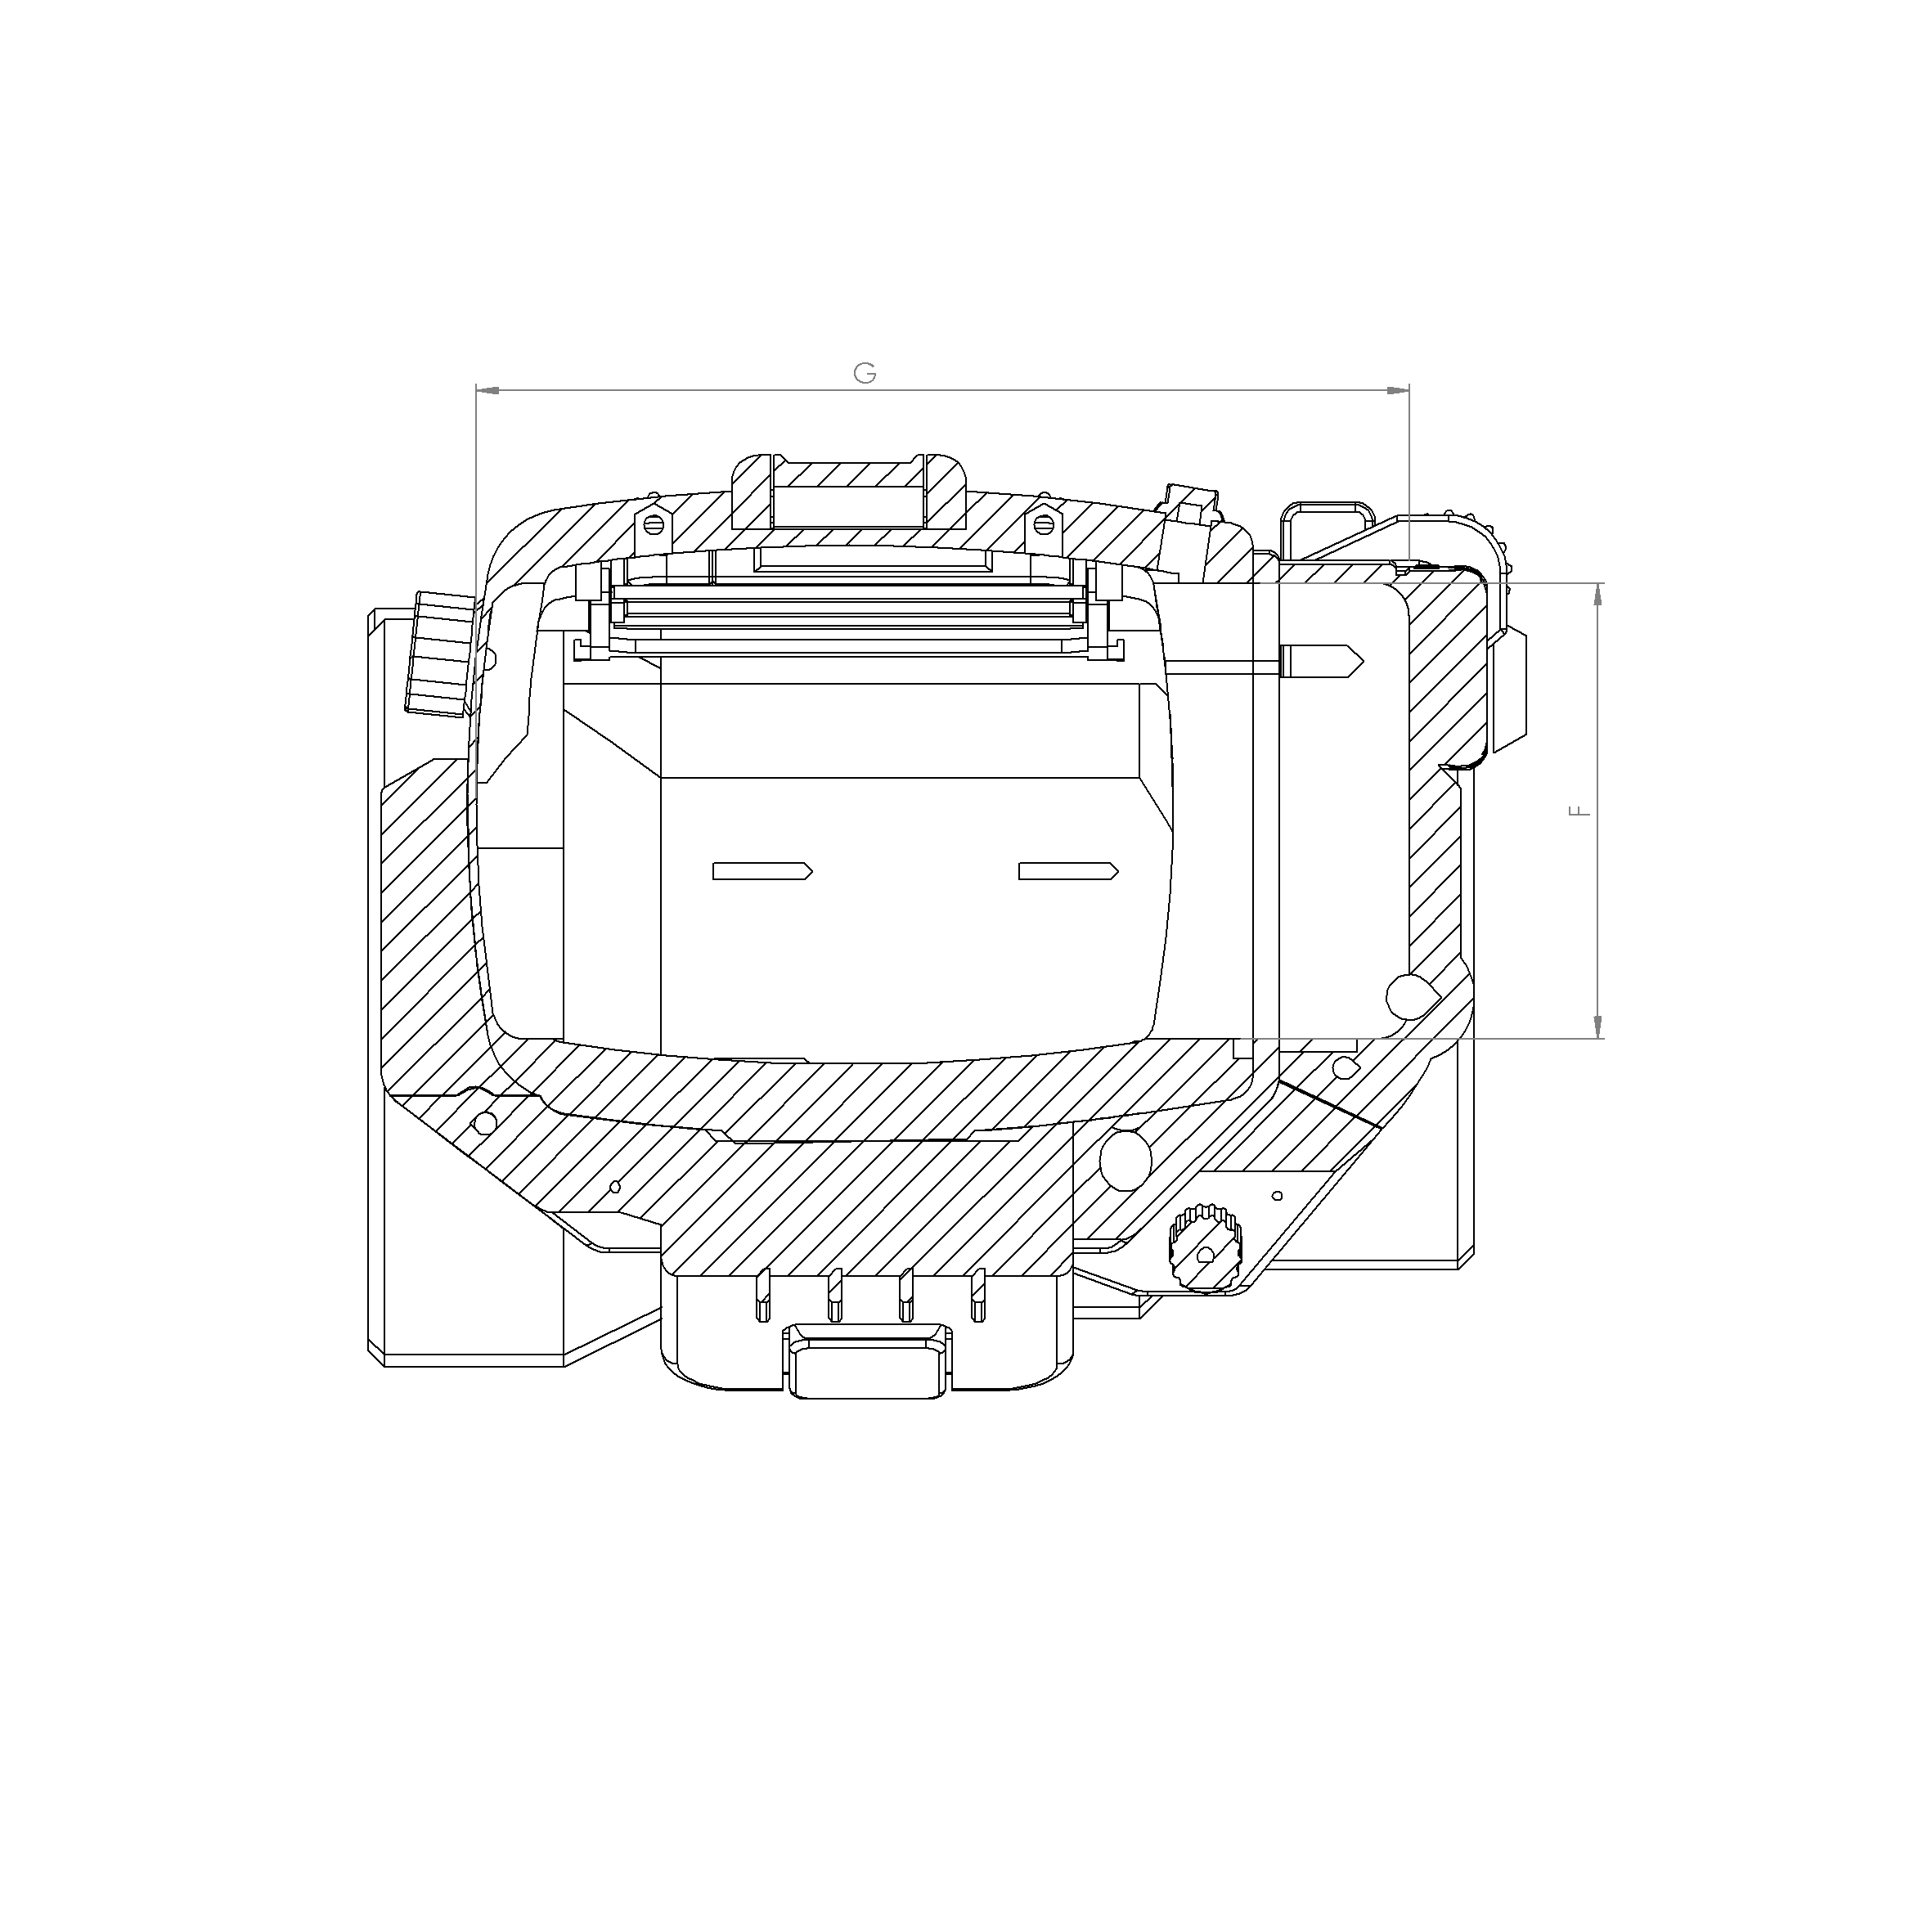 Audi R8 Coil Wiring Diagram. Audi. Auto Wiring Diagram